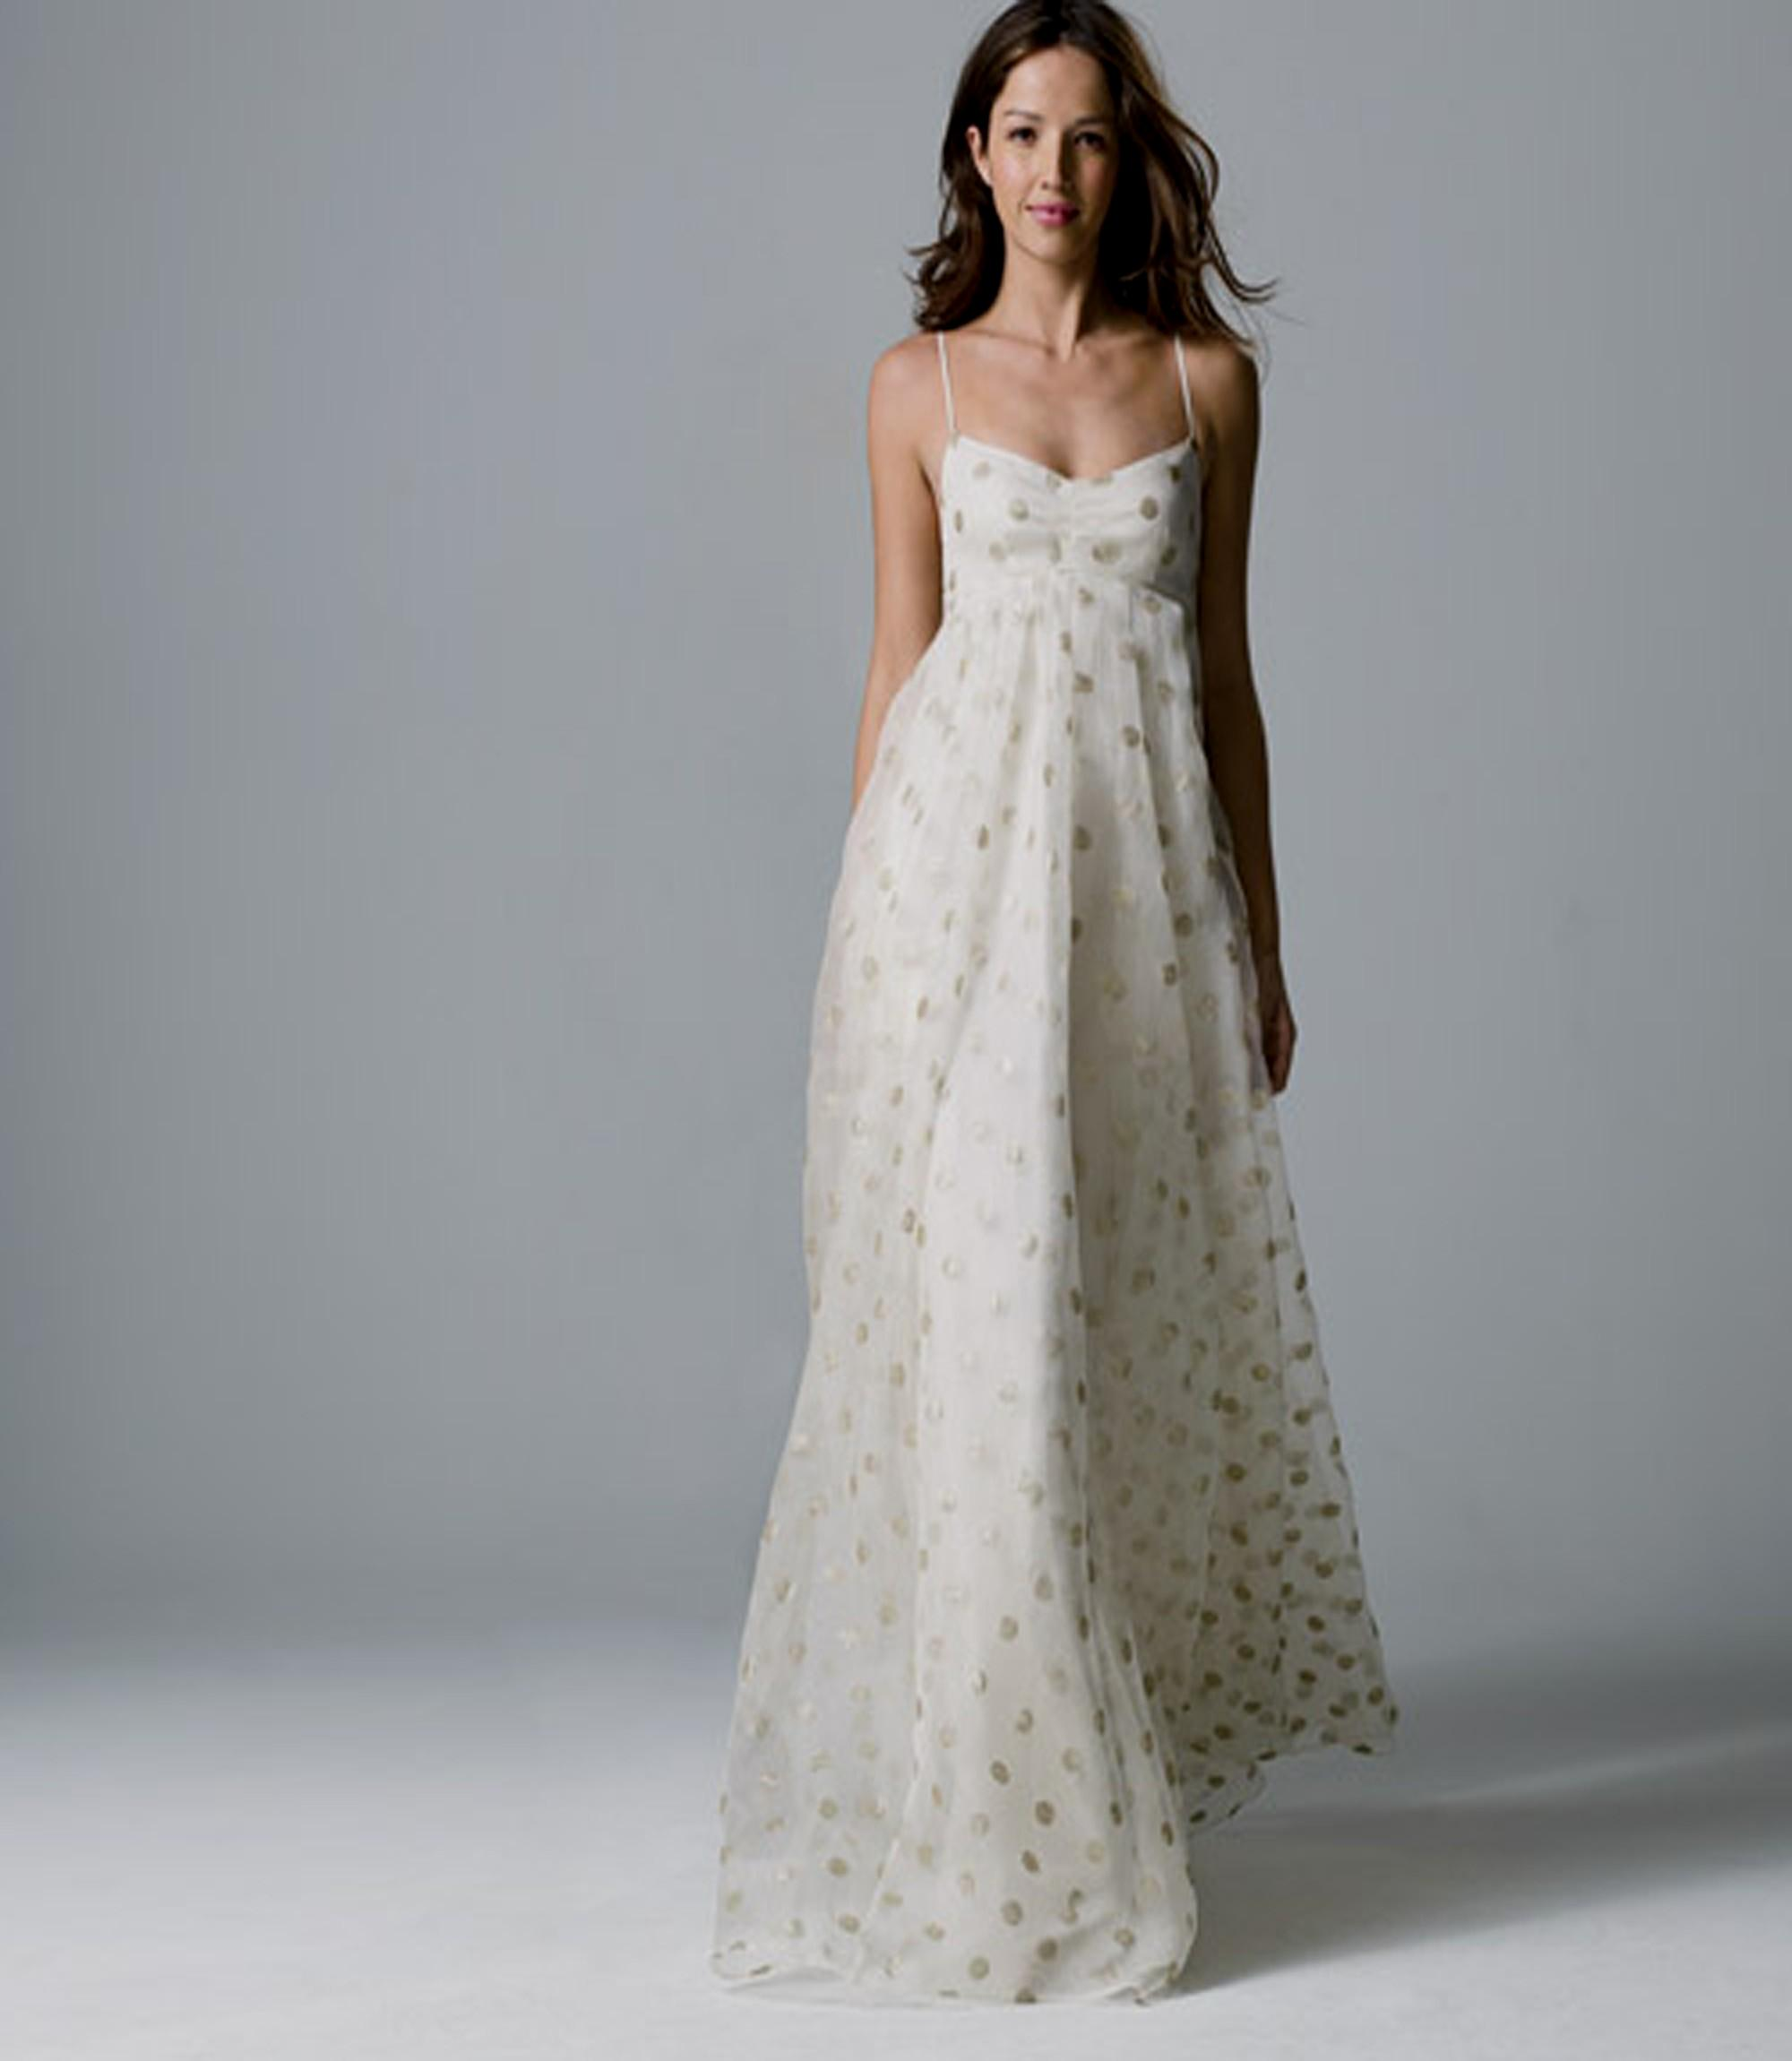 beach wedding dresses for older brides photo - 1